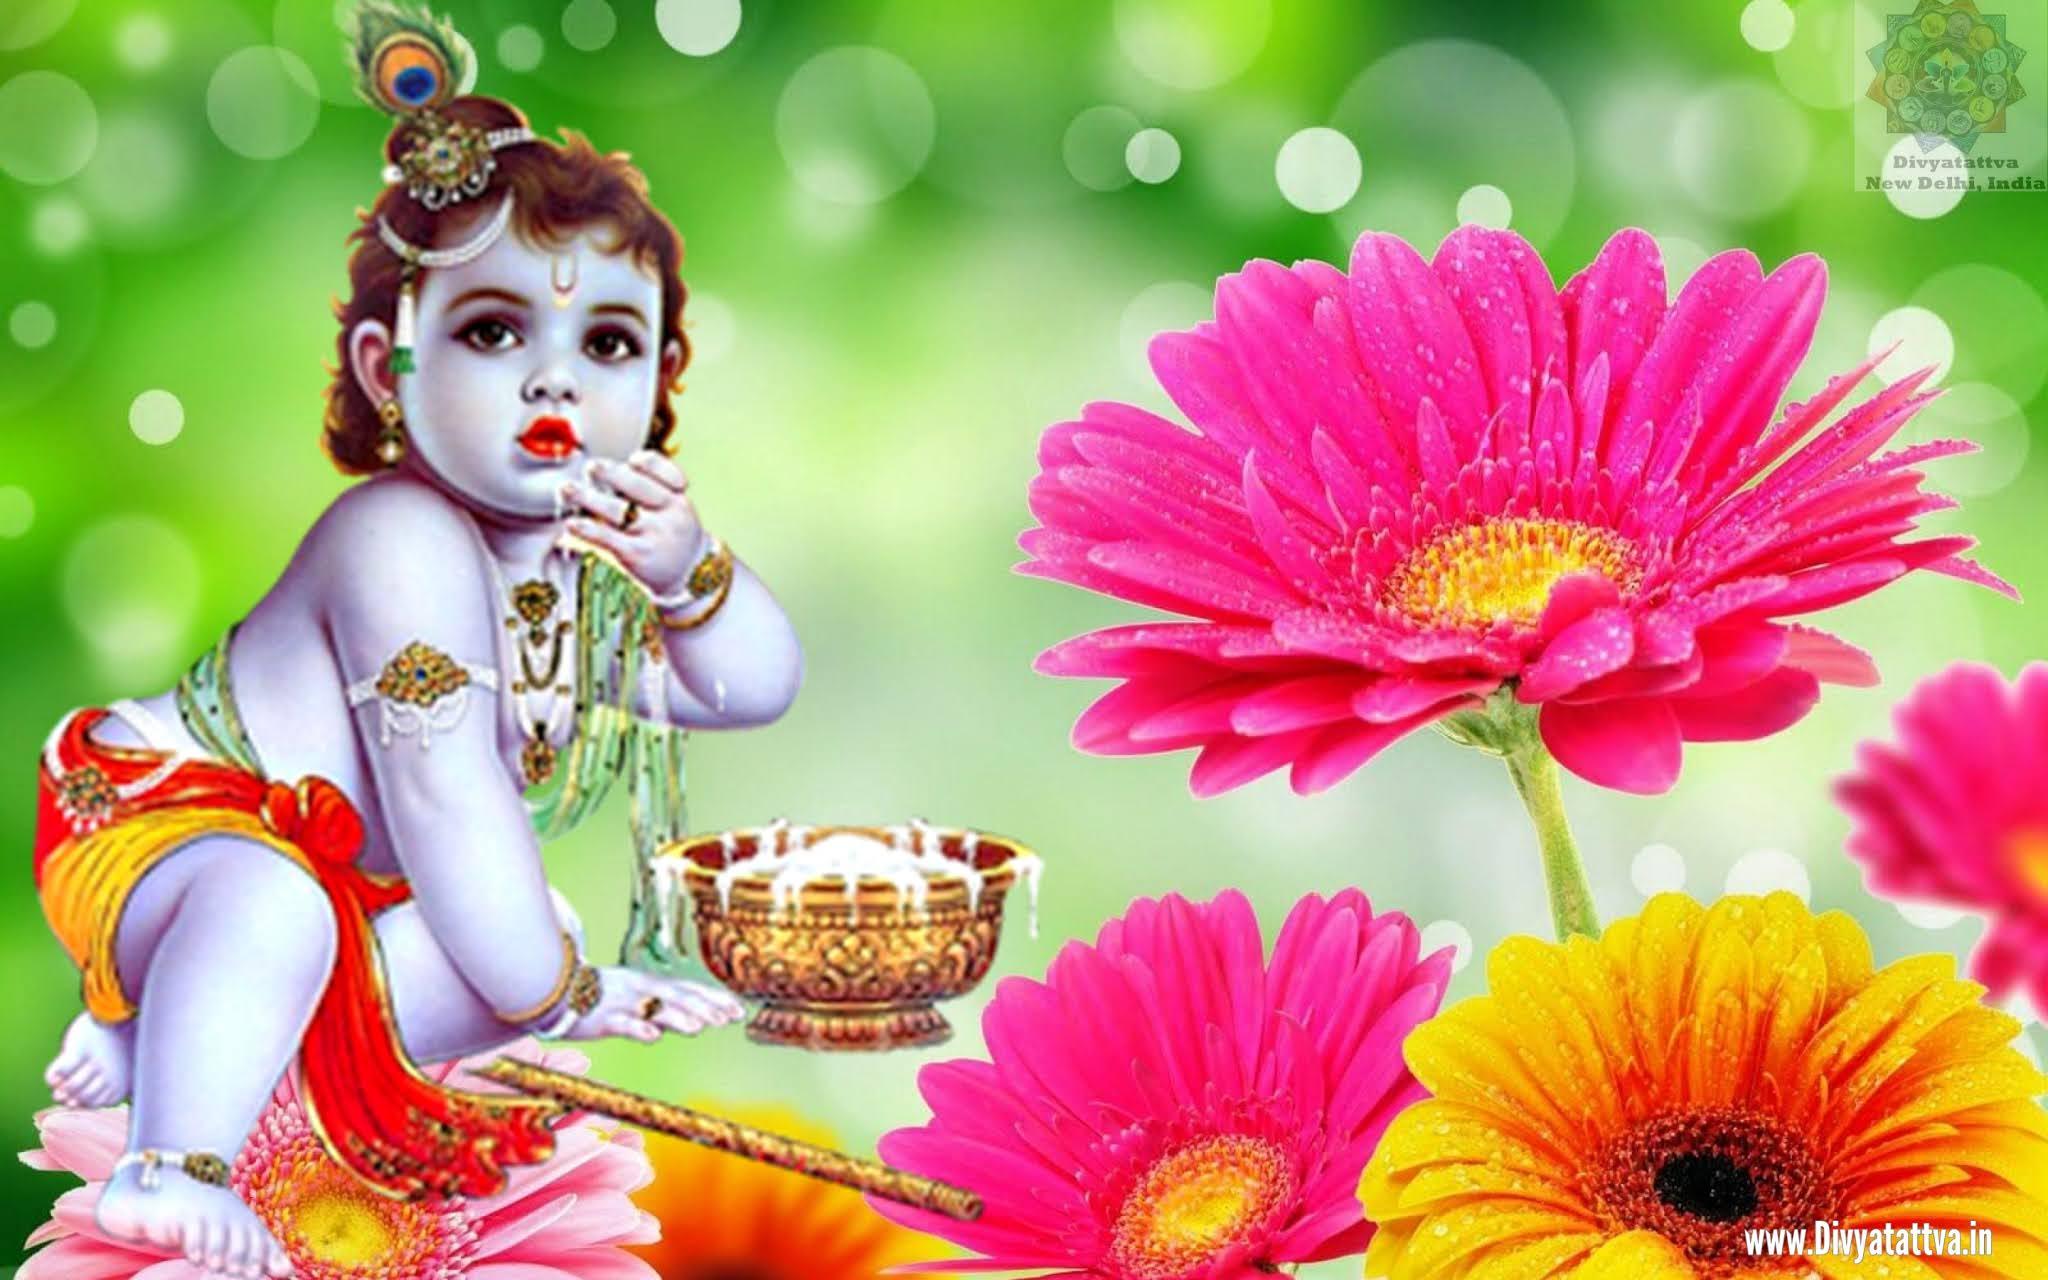 cute little krishna images, baby krishna wallpaper hd, 1080p cute little krishna images hd